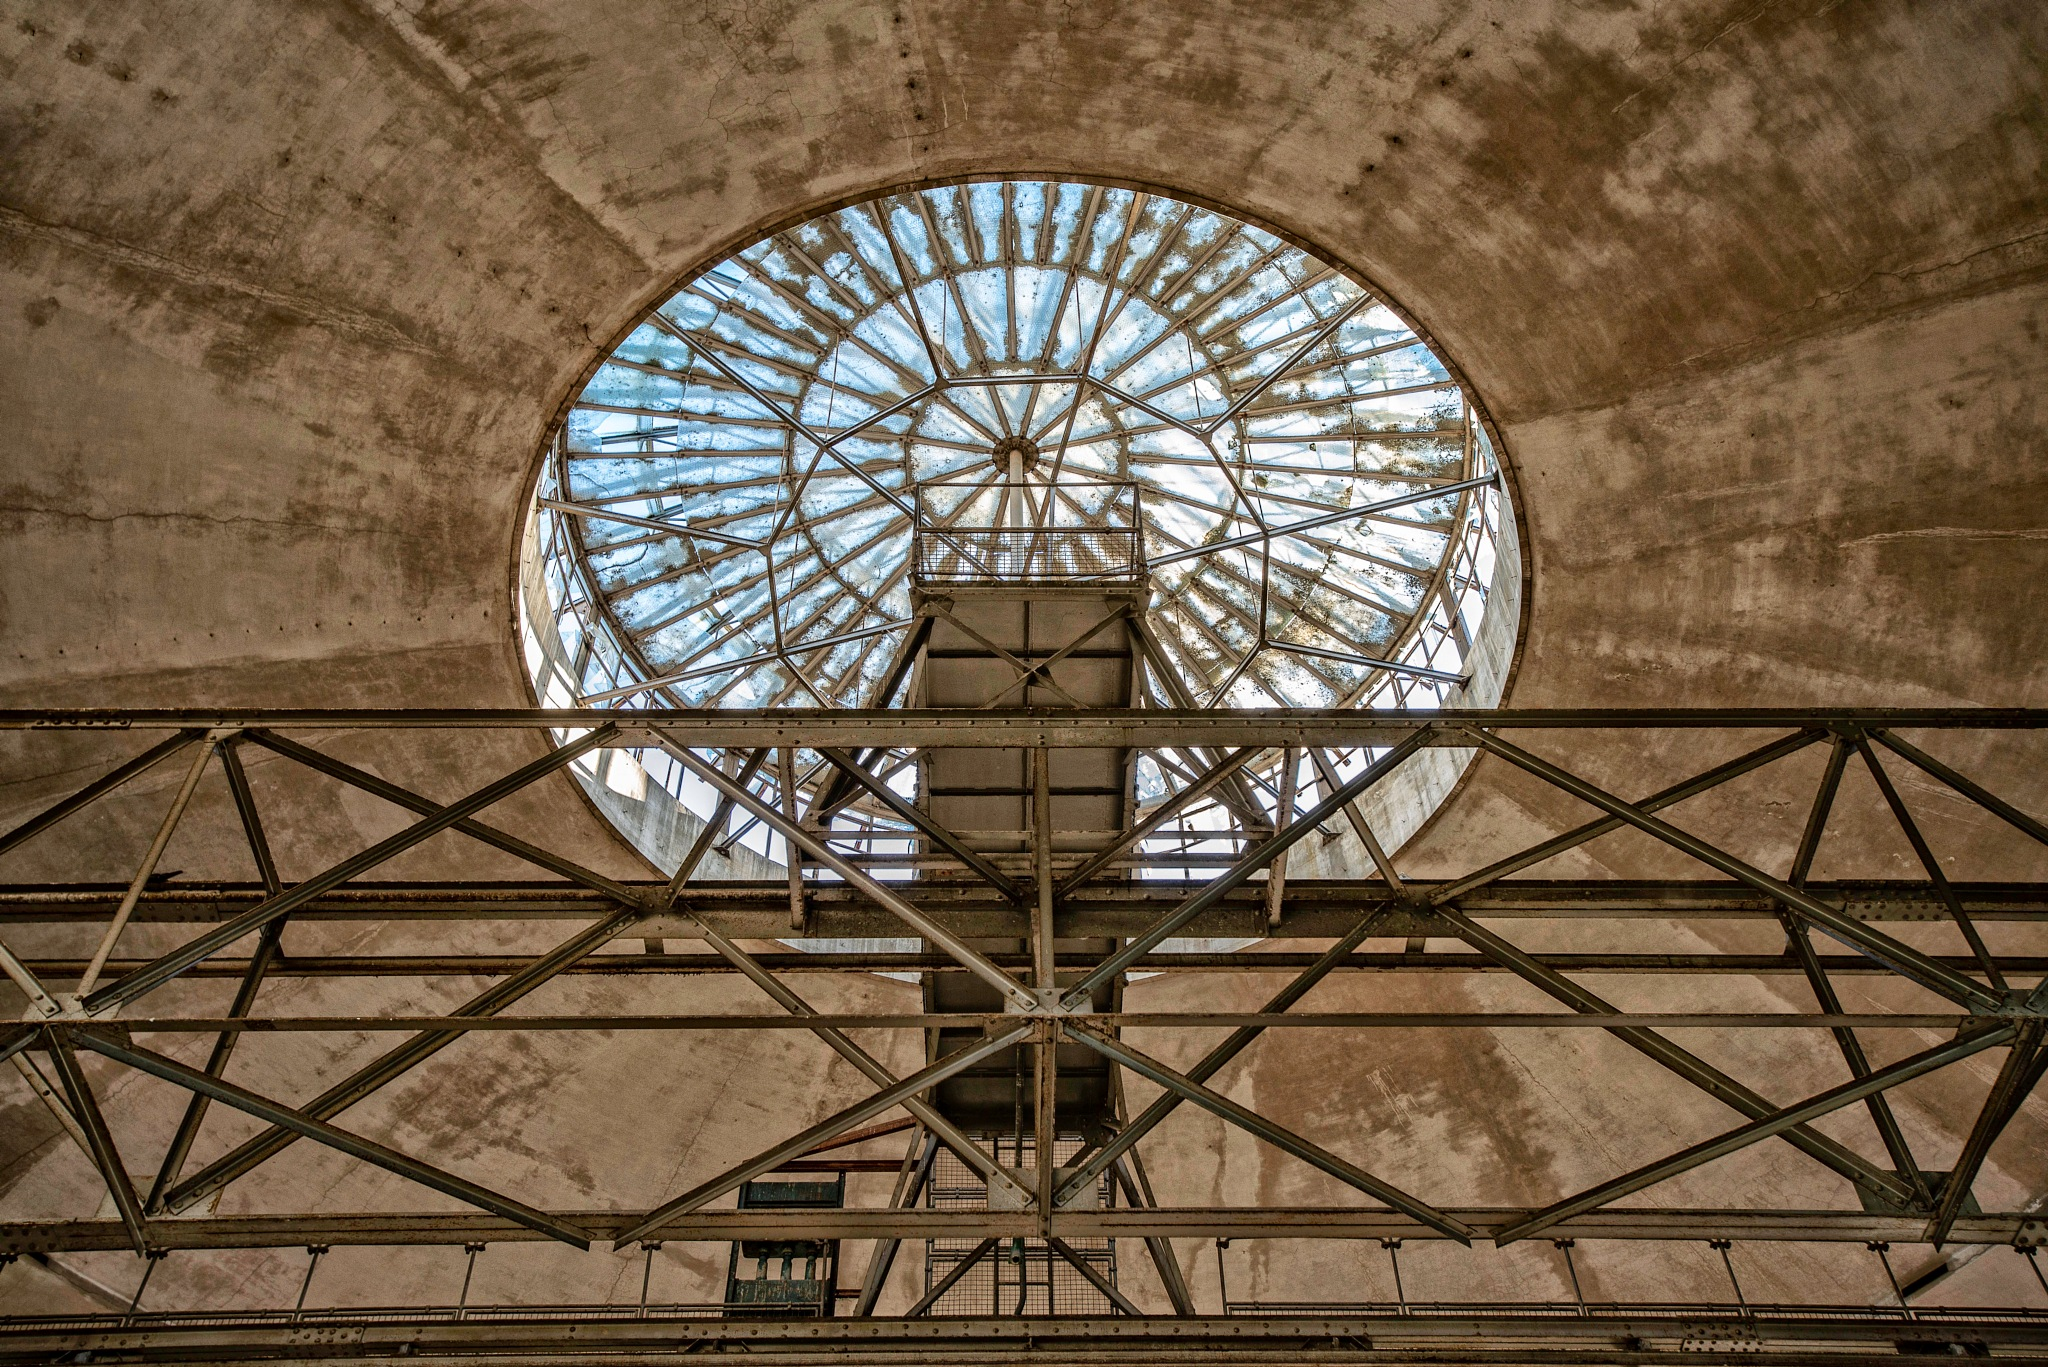 oculus by jean